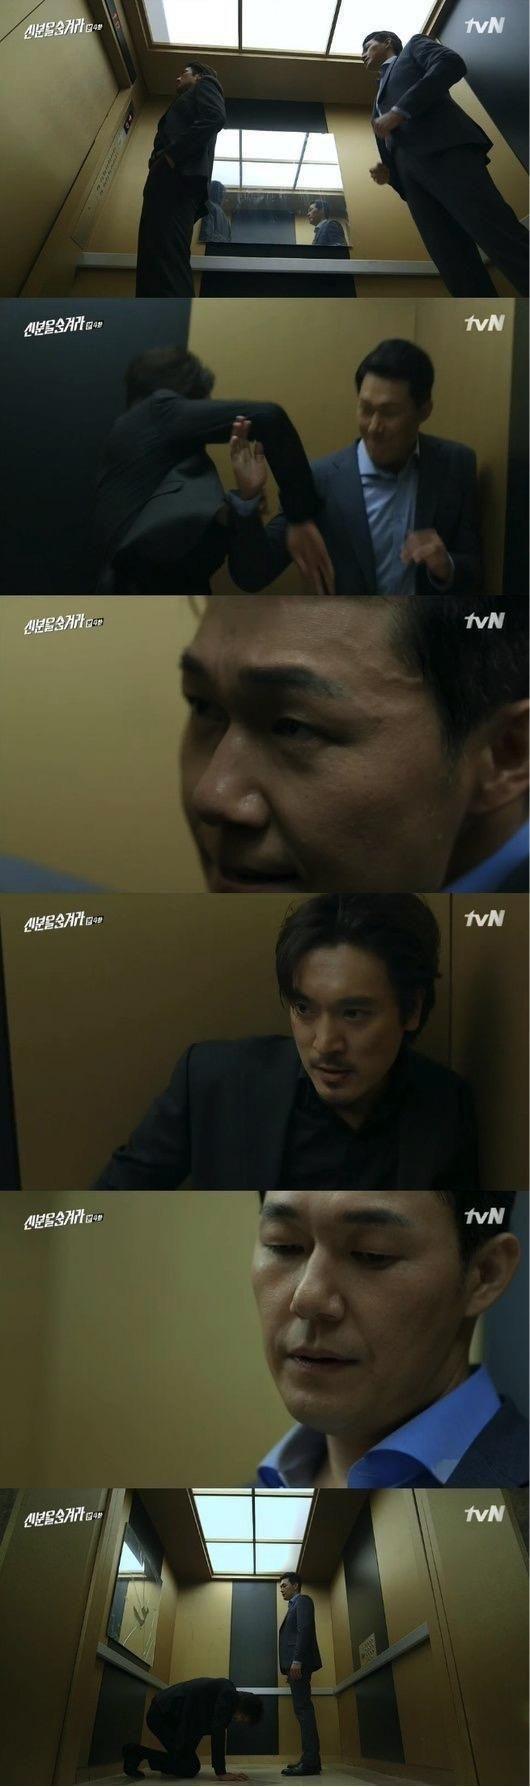 'Hidden Identity' Park Sung Woong And Kim Min Joon Fight In Elevator - http://asianpin.com/hidden-identity-park-sung-woong-and-kim-min-joon-fight-in-elevator/